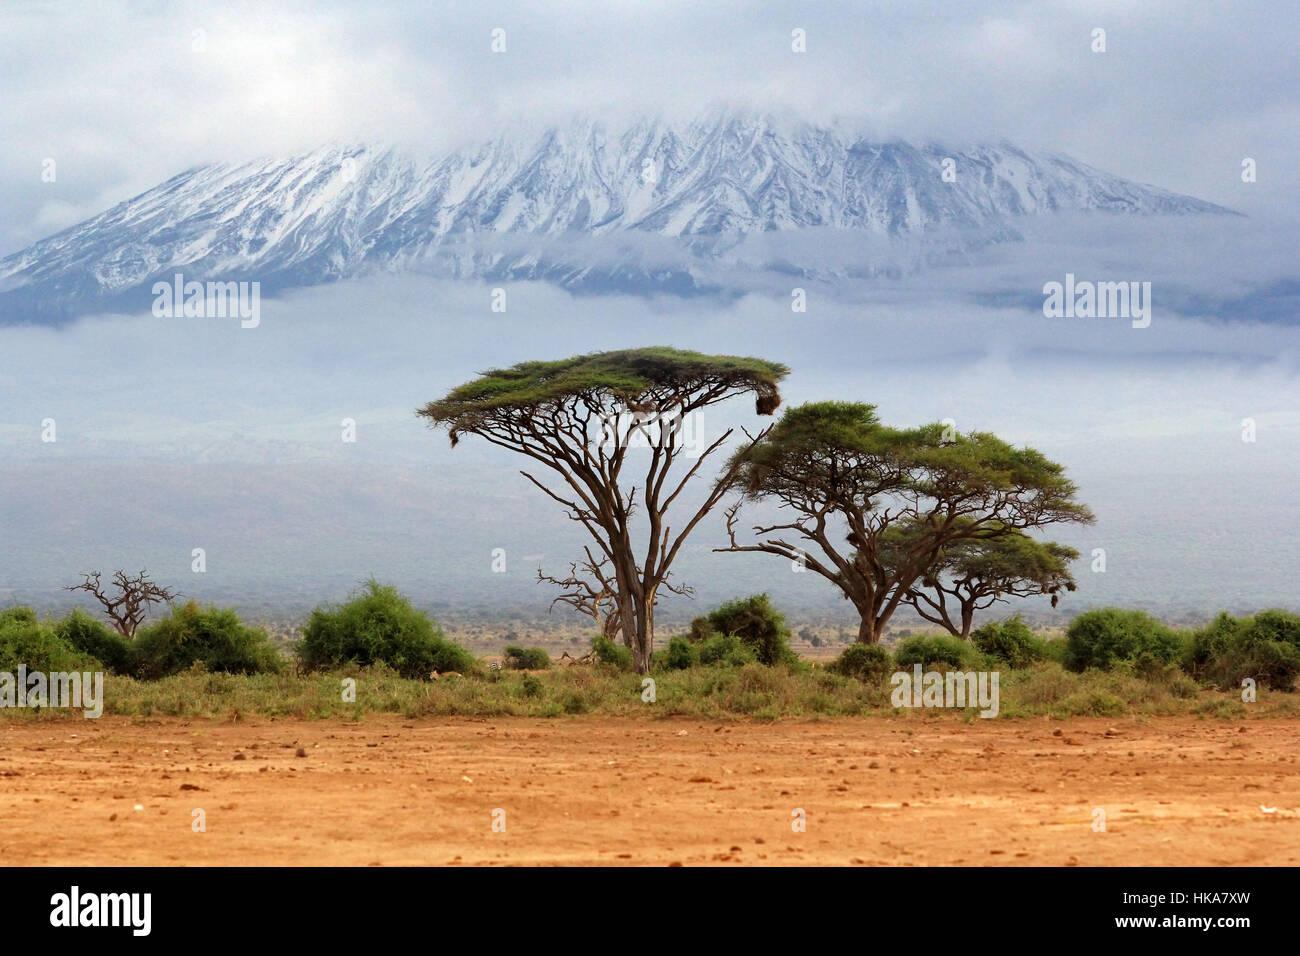 Mount Kilimanjaro, Kenia, the highest mountain in Africa. - Stock Image